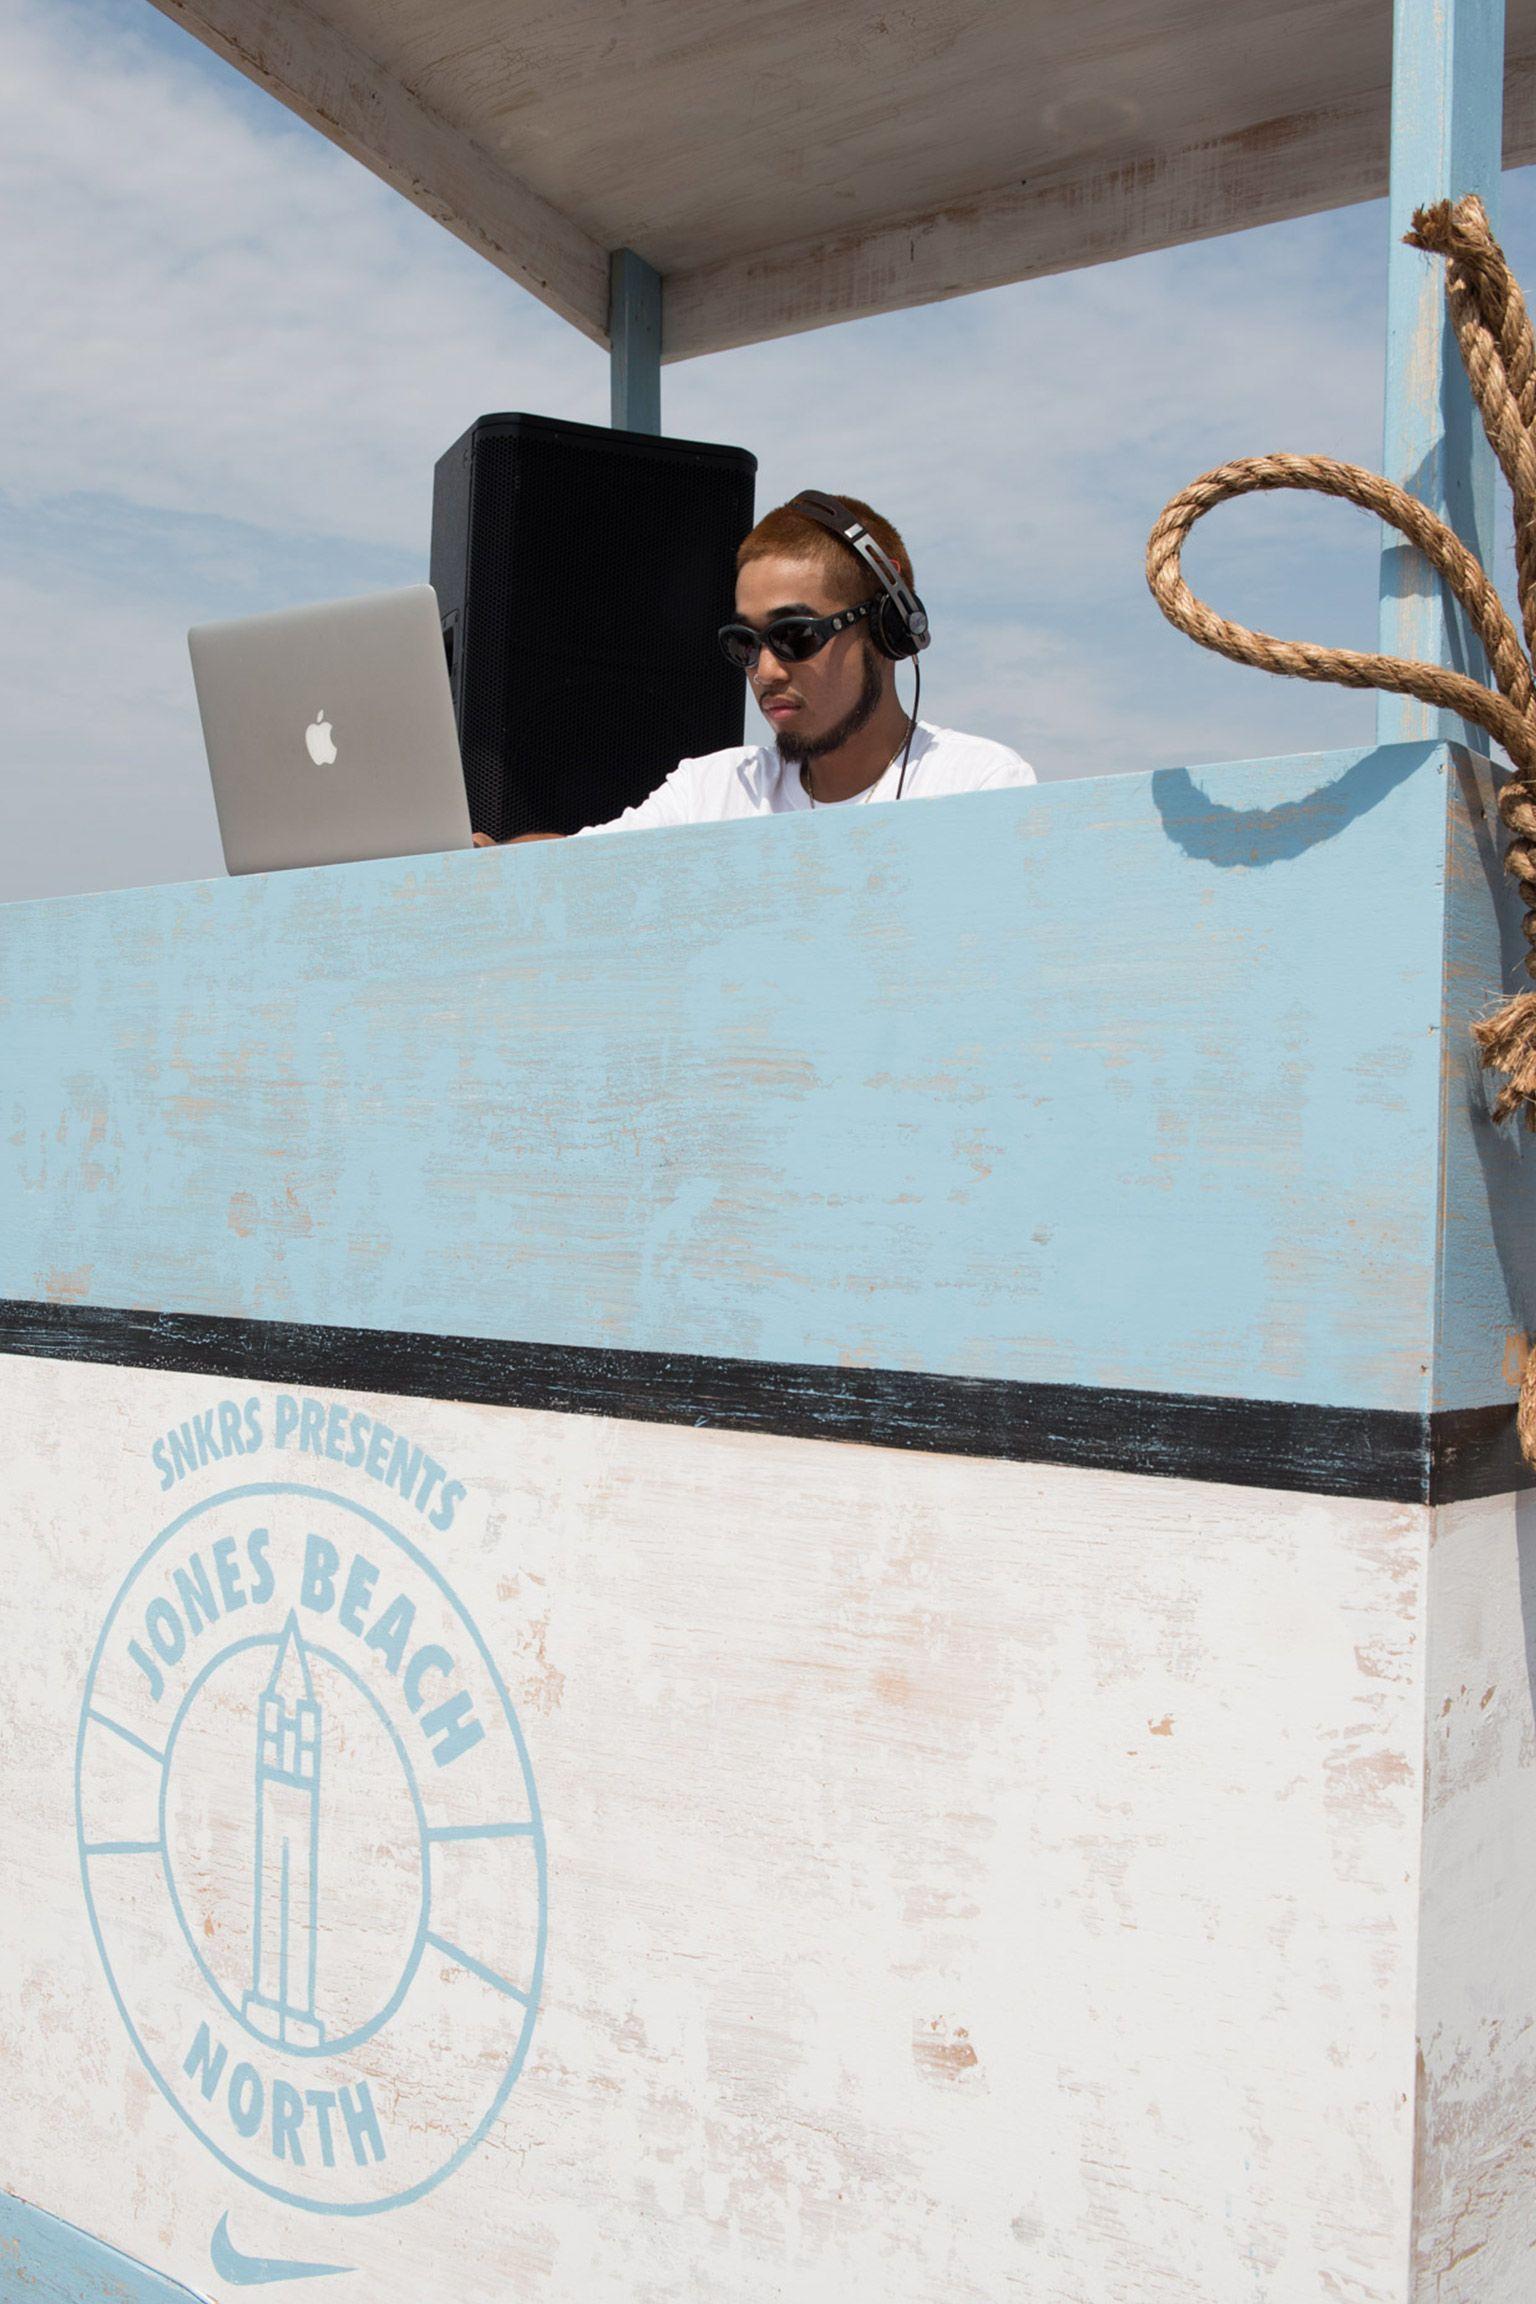 SNKRS Presents: Jones Beach North